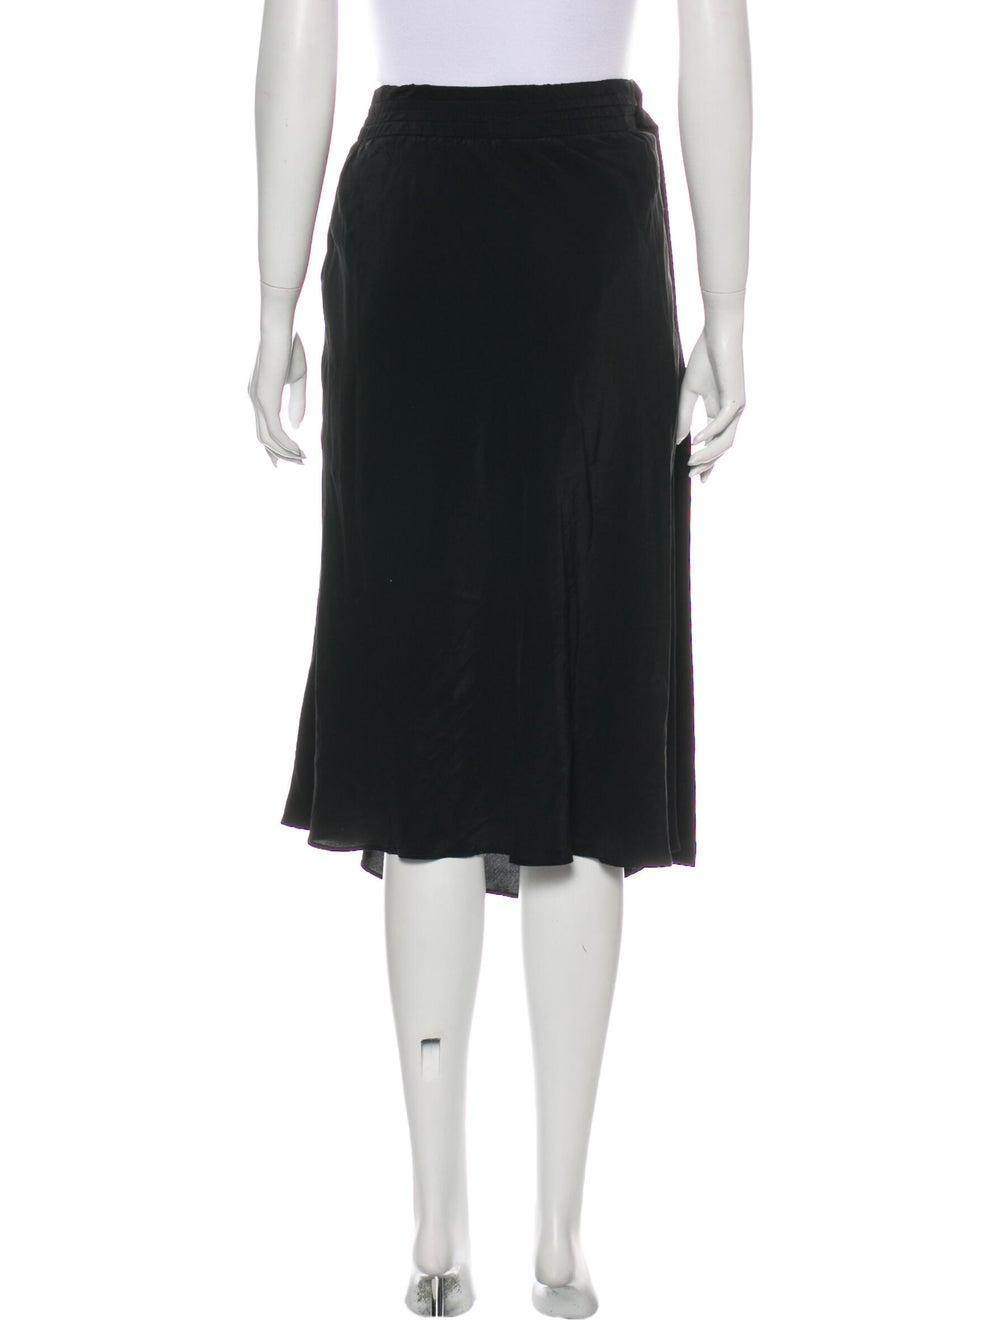 Acne Studios Midi Length Skirt Black - image 3